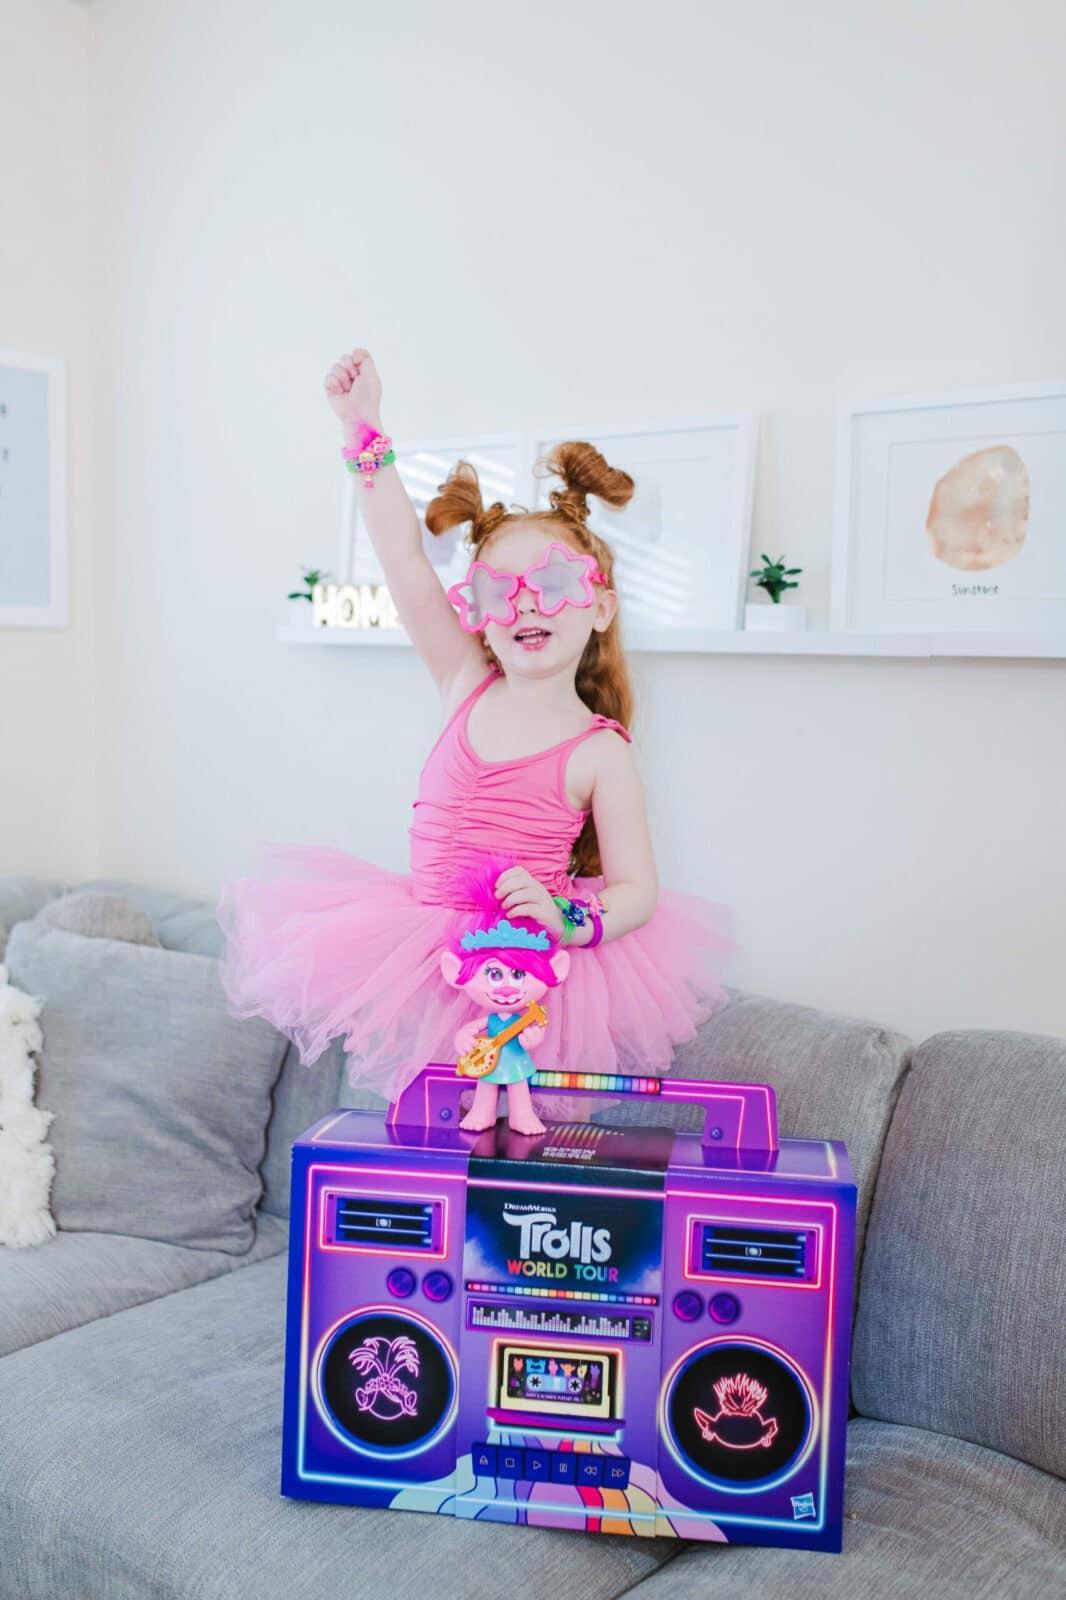 poppy trolls world tour plum NYC tutu